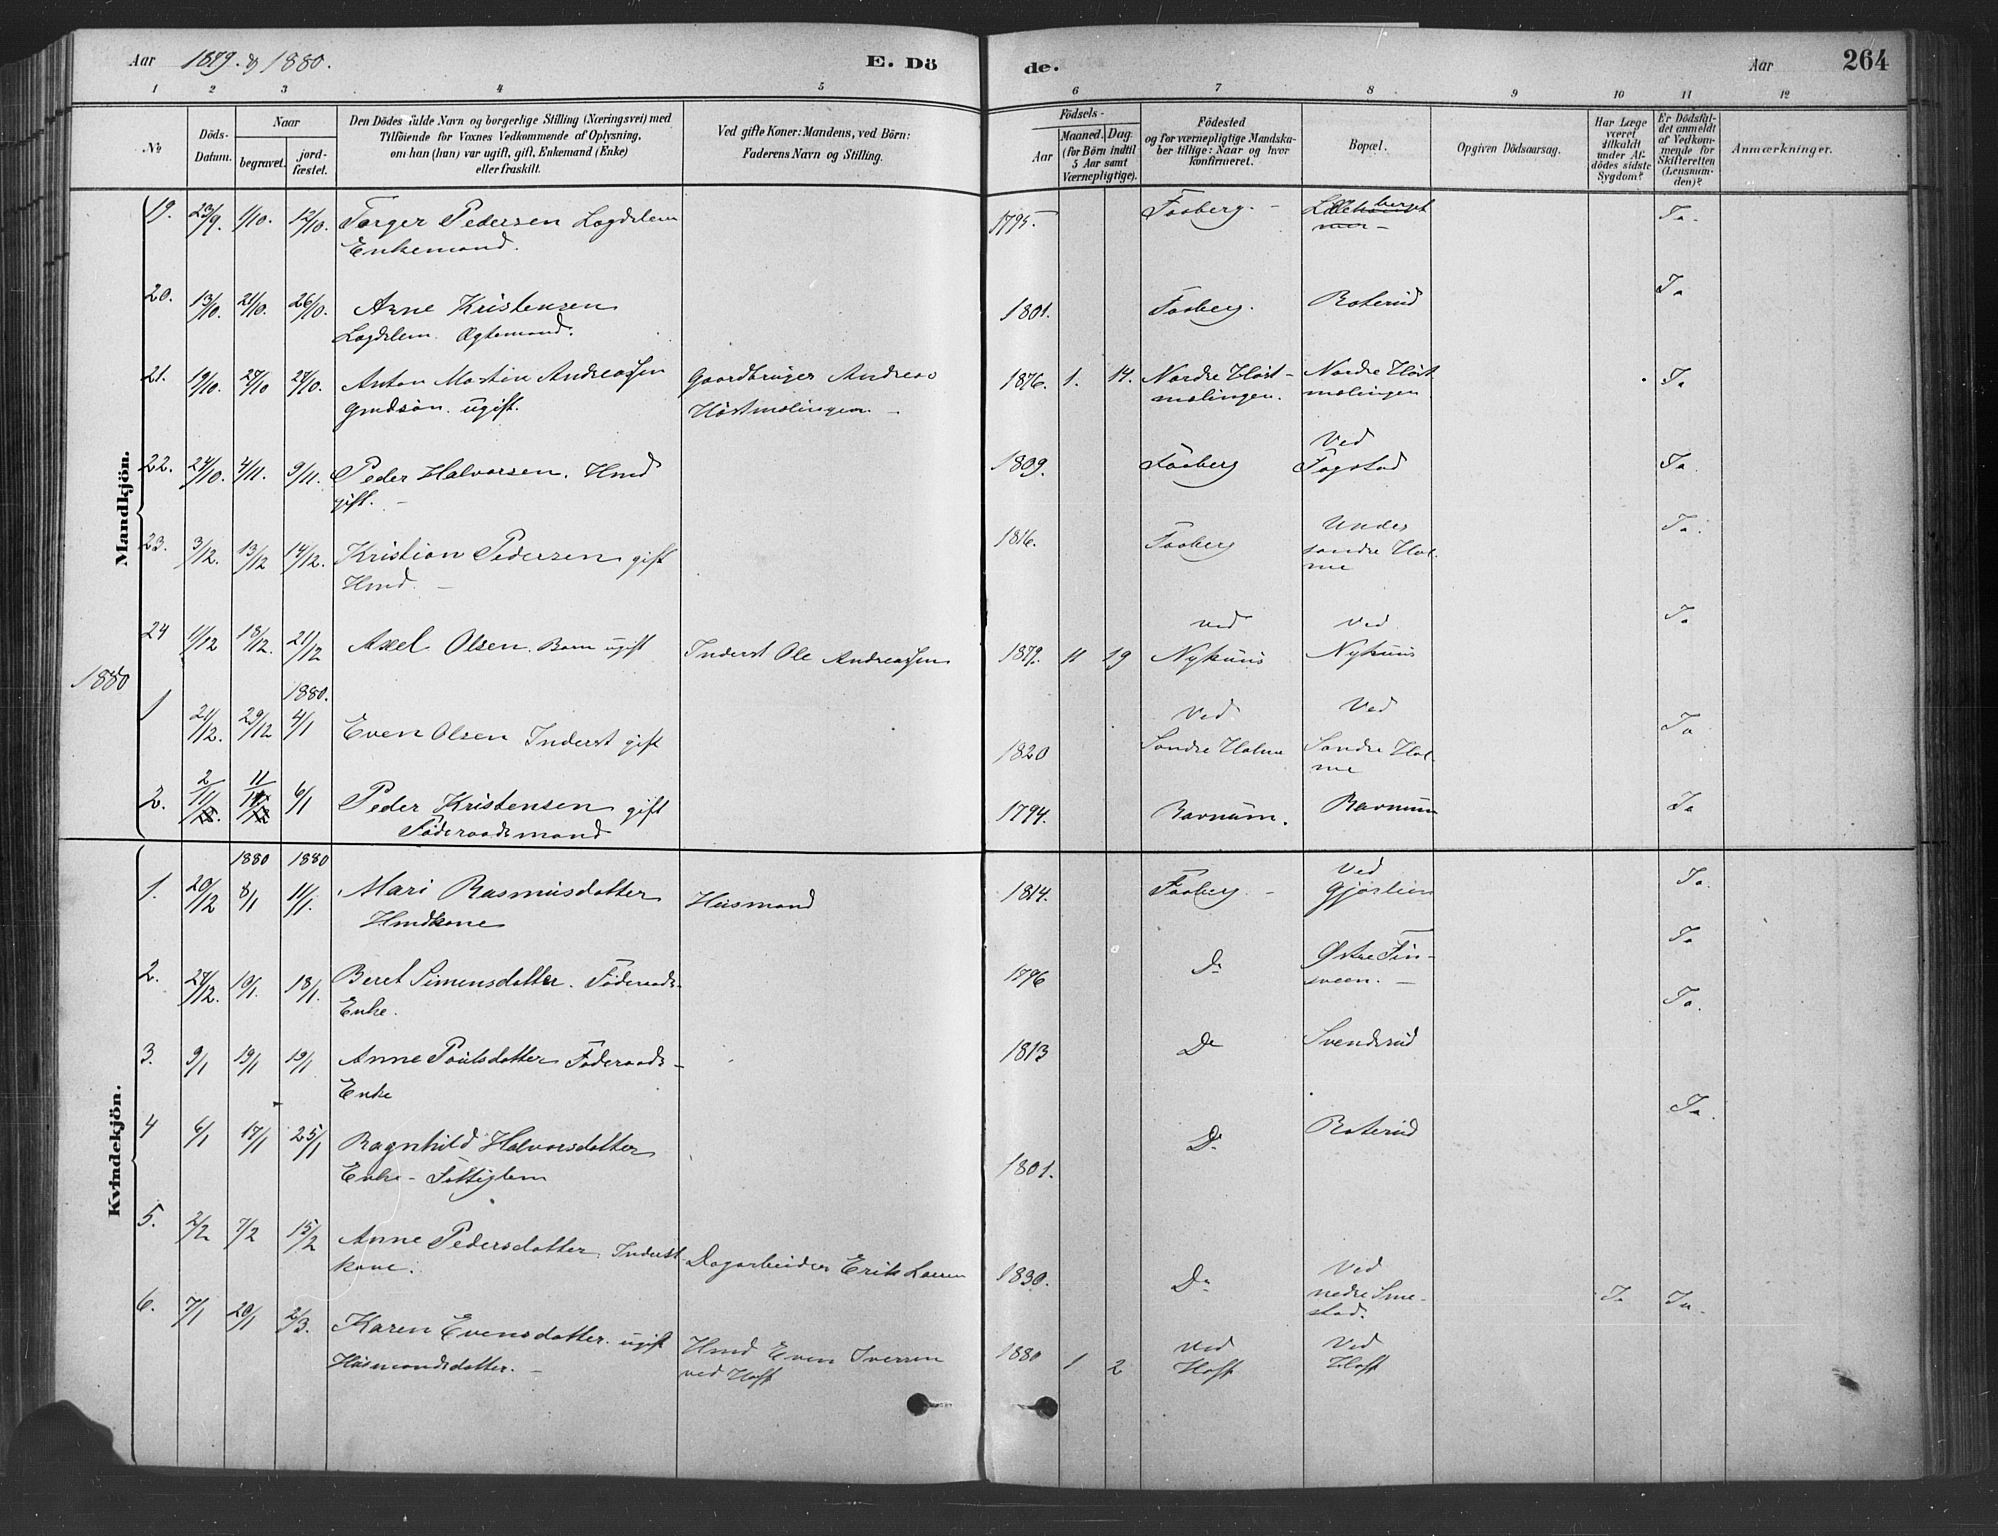 SAH, Fåberg prestekontor, Ministerialbok nr. 9, 1879-1898, s. 264